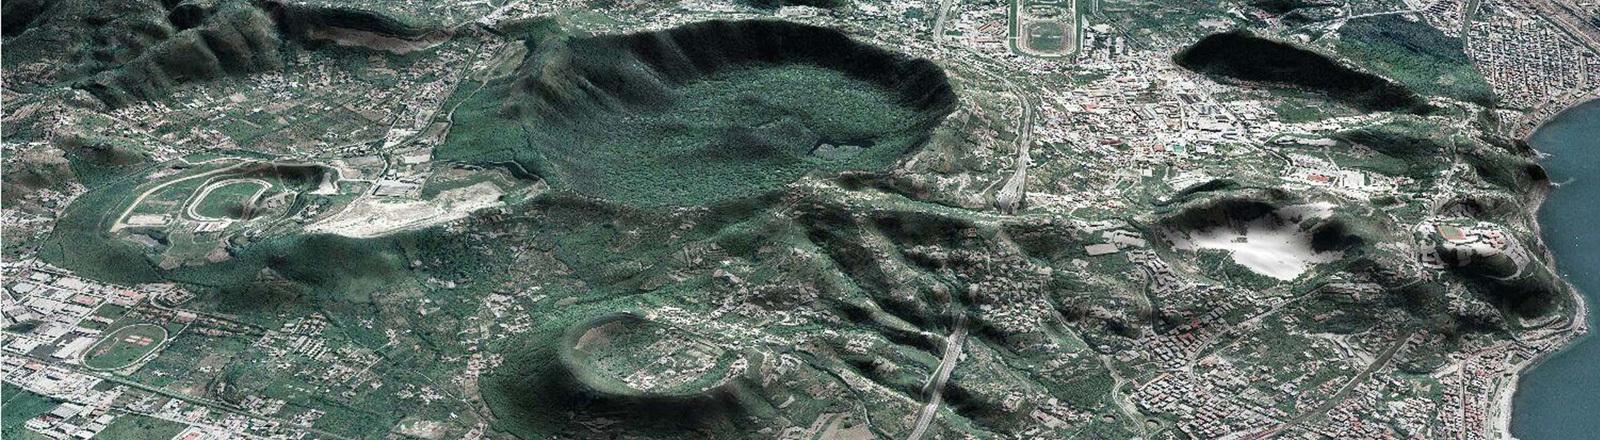 Luftaufnahme vom Campi Flegrei bei Neapel.